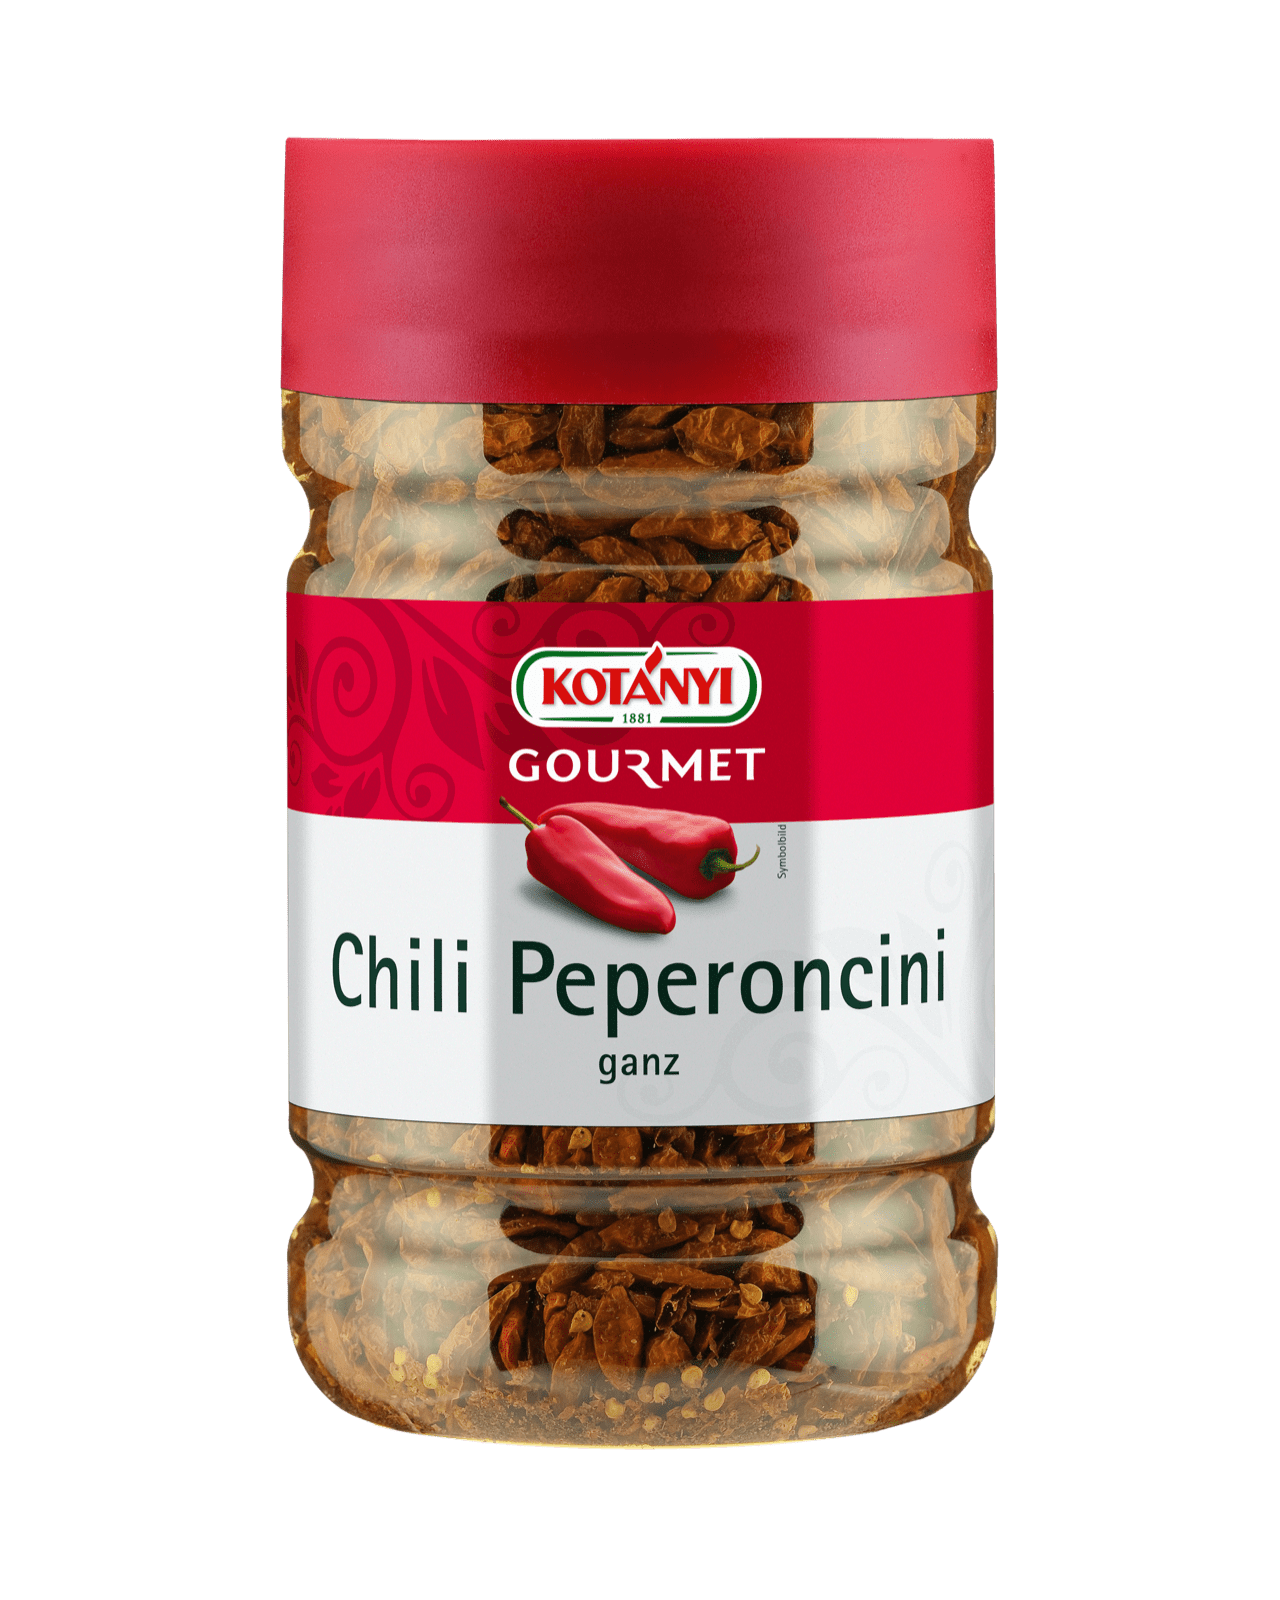 Kotányi Gourmet Chili Peperoncini ganz in der 1200ccm Dose